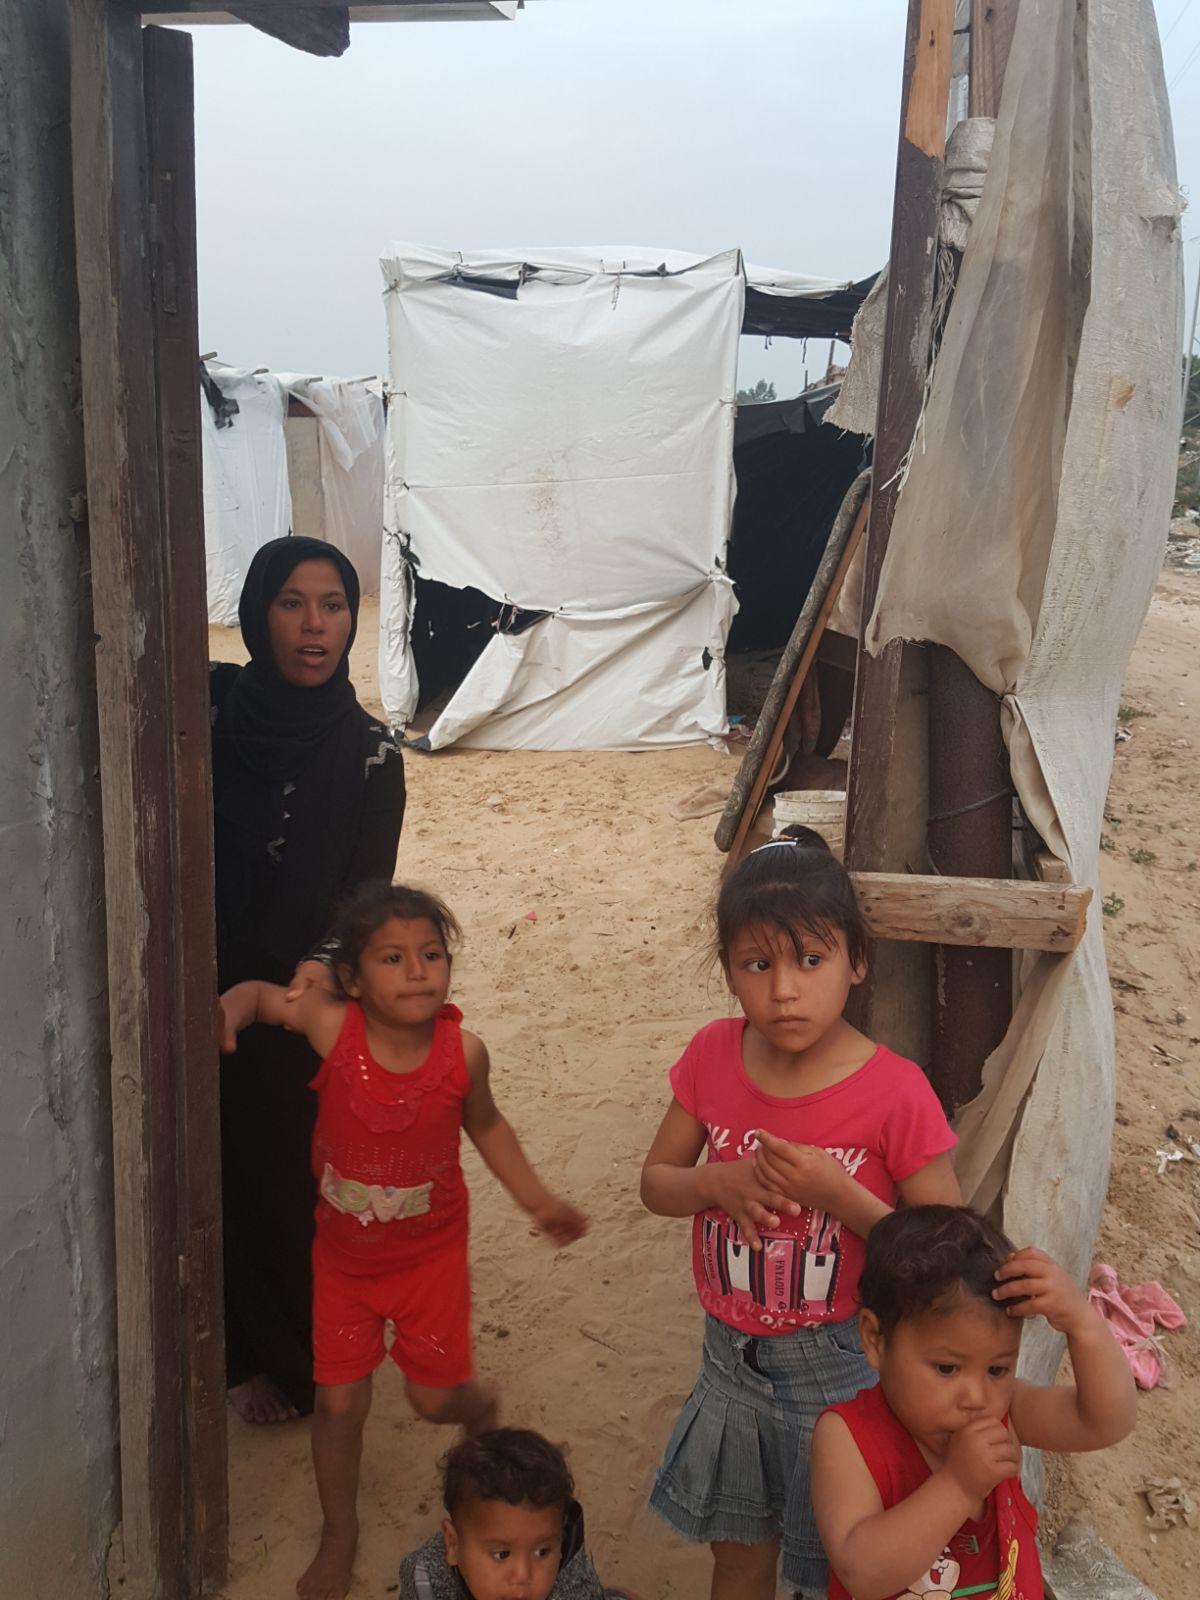 Abeer and her children.